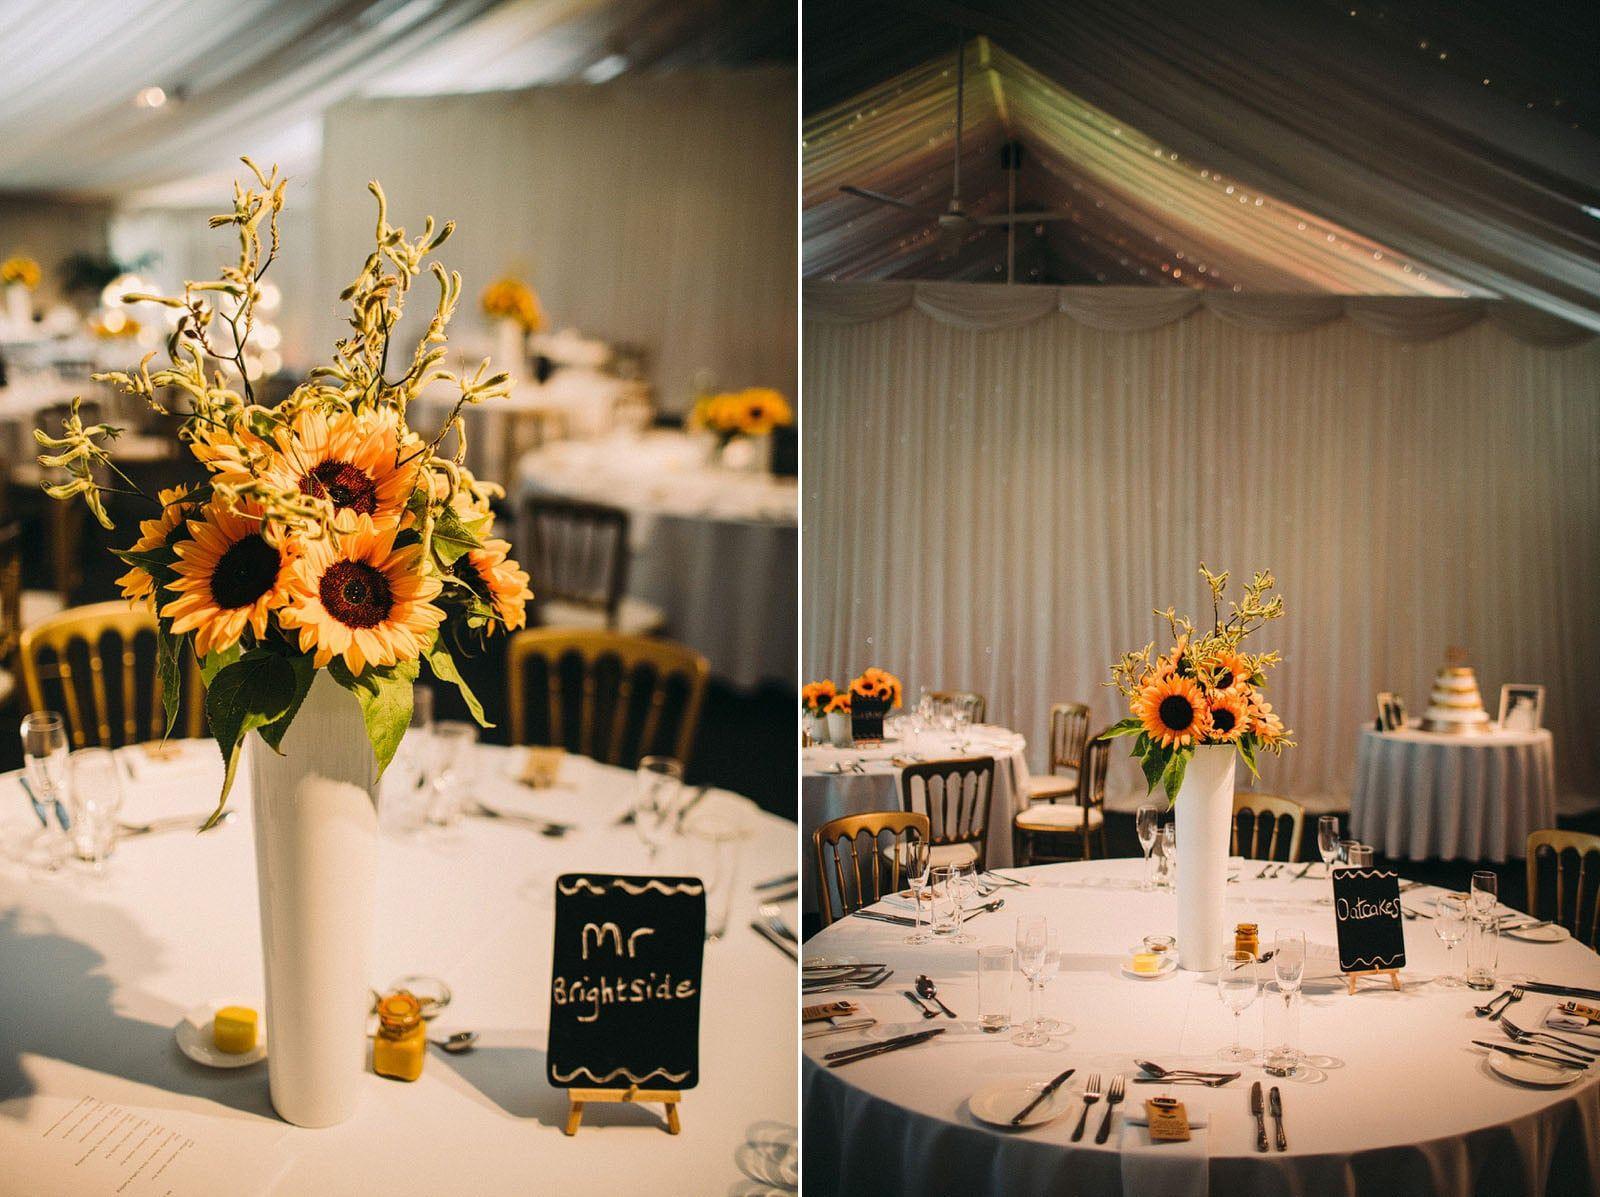 Heaton House Farm Wedding Venue Cheshire Lawson Photography